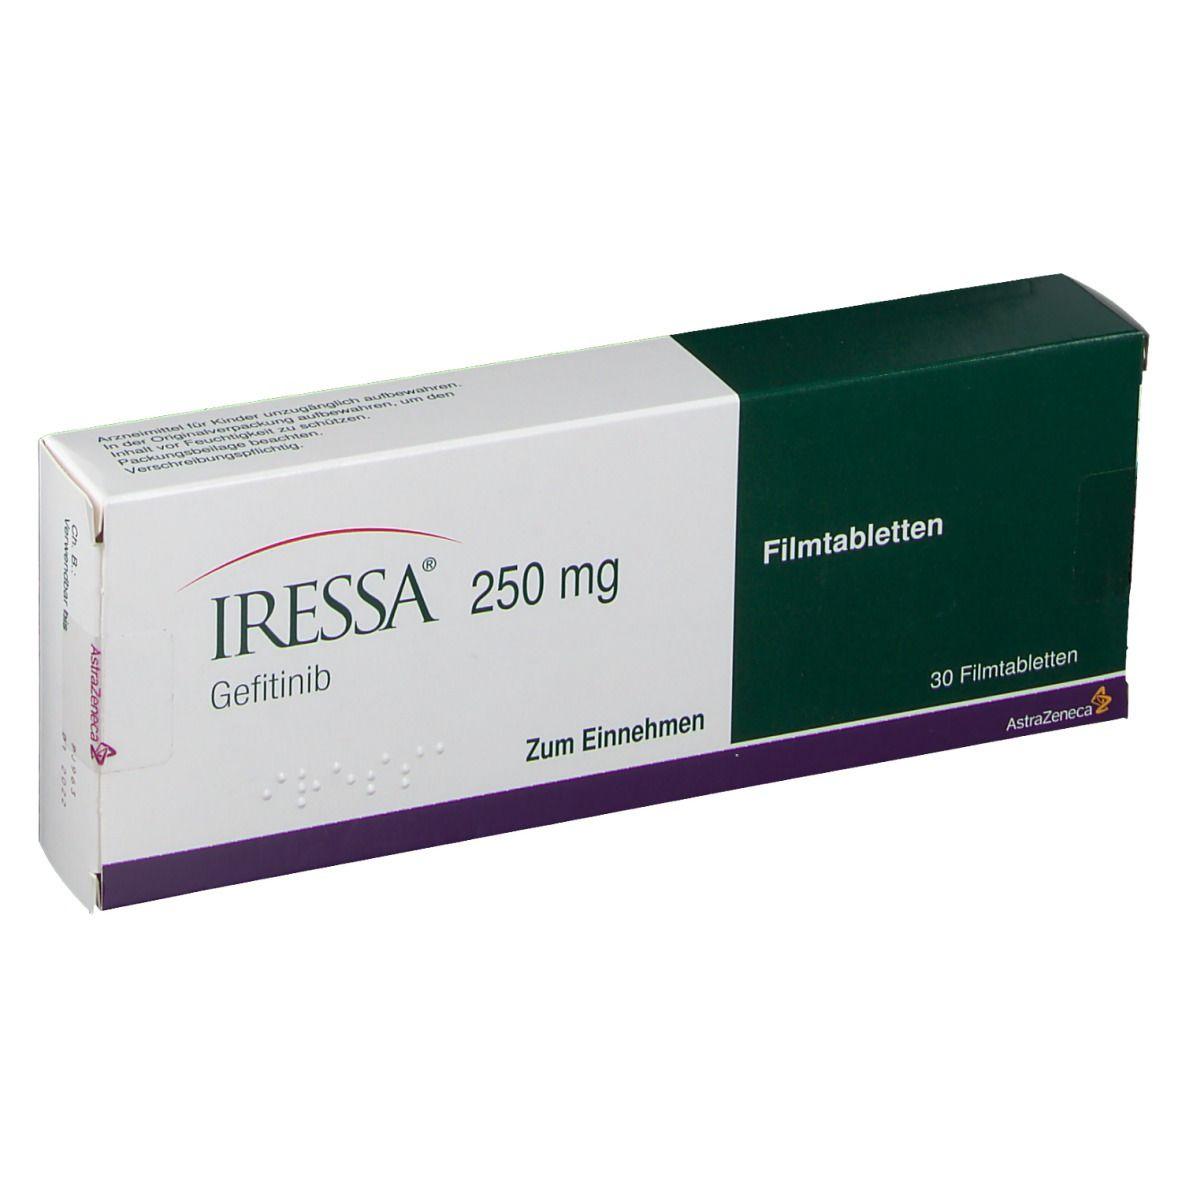 IRESSA 250 mg Filmtabletten